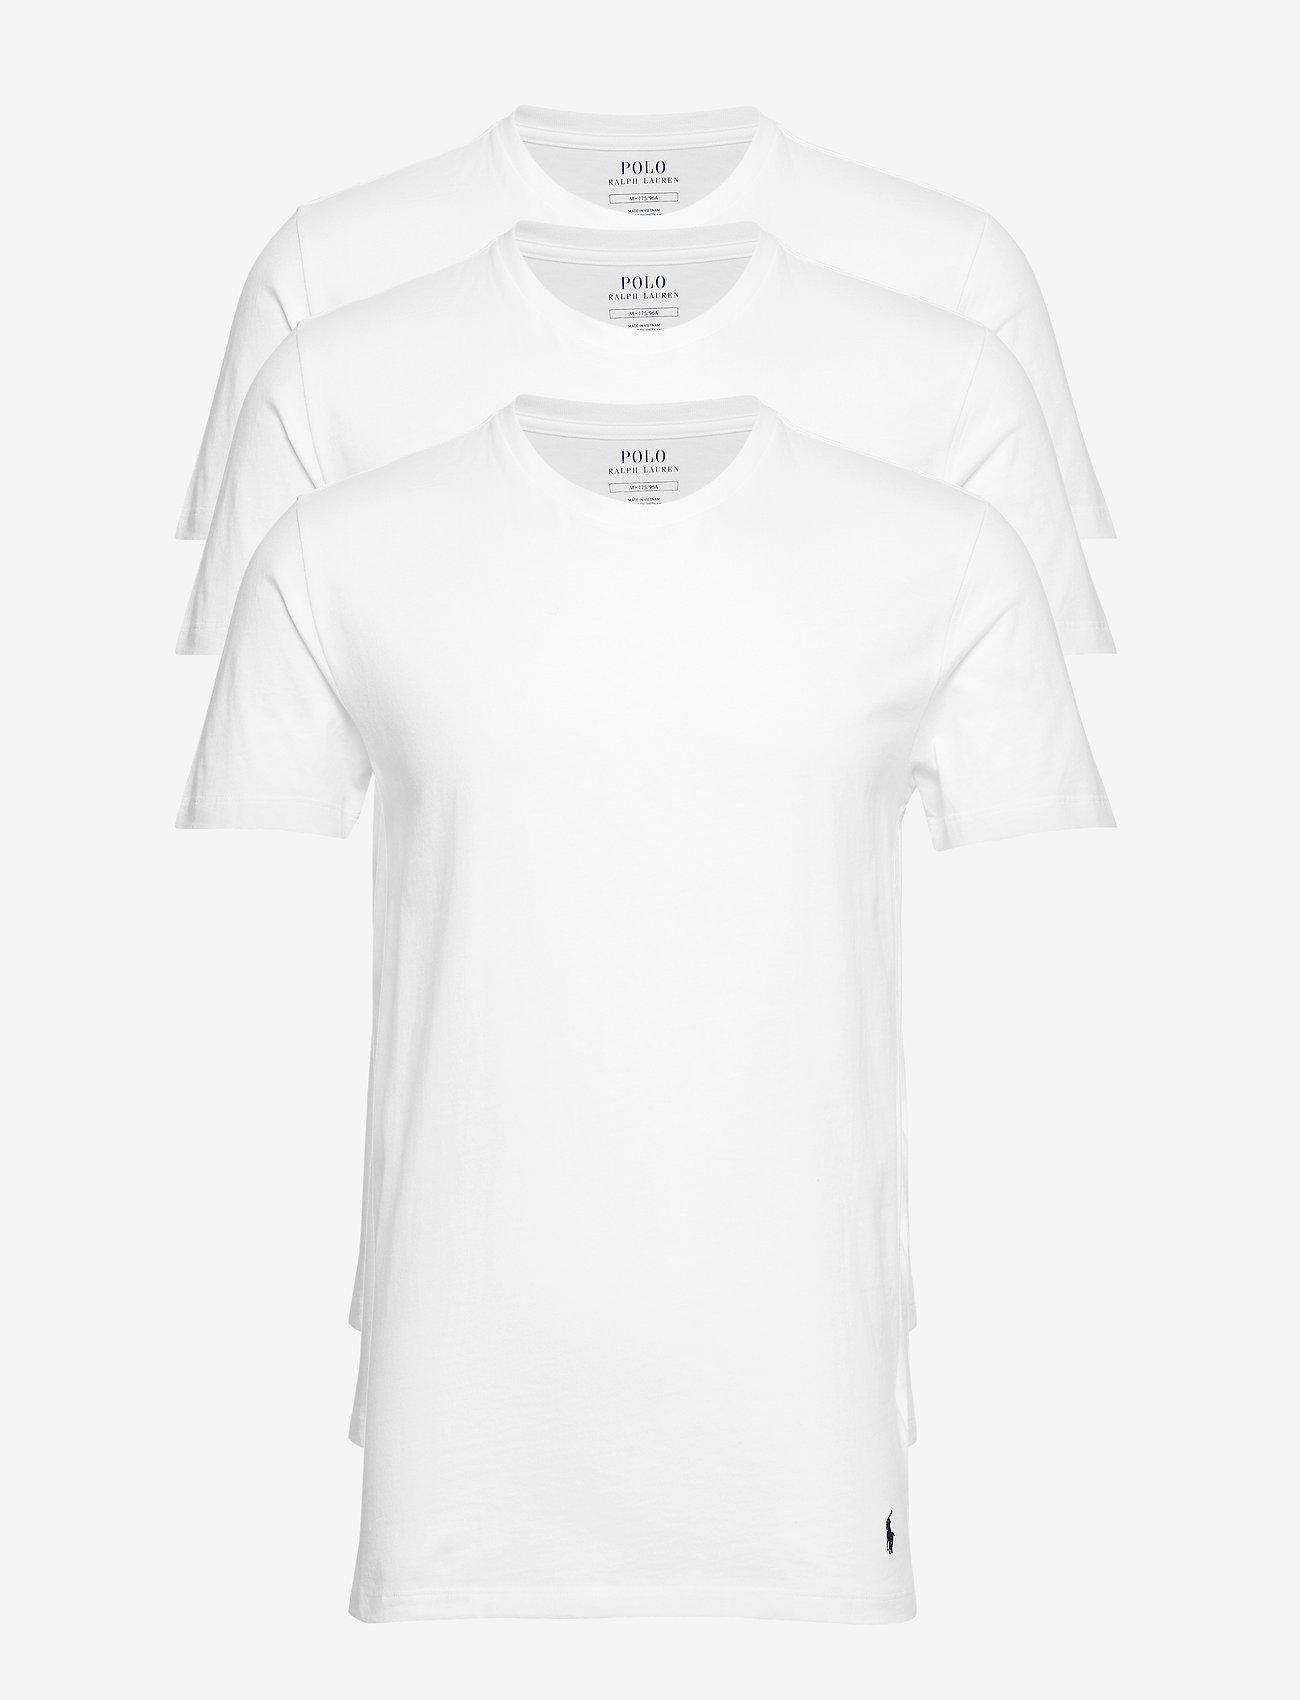 Polo Ralph Lauren Underwear - Cotton Crewneck 3-Pack - multipack - 3pk white/white/w - 0